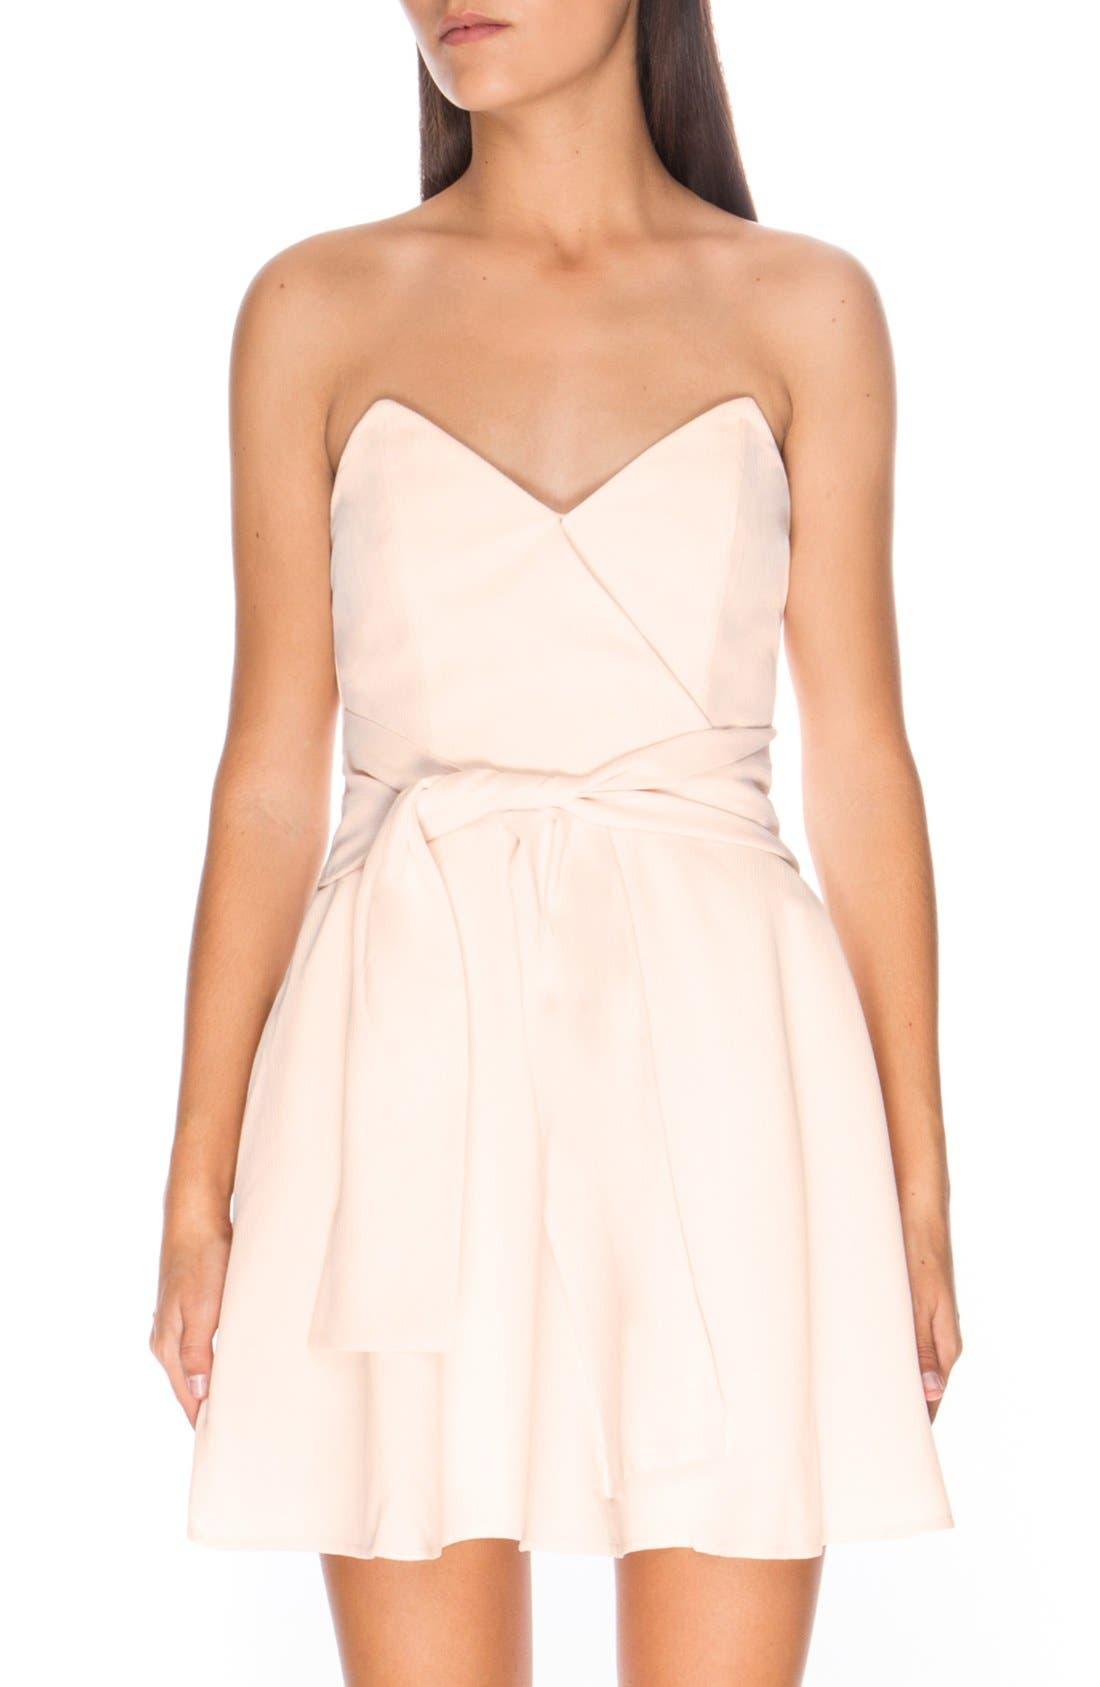 Alternate Image 1 Selected - Keepsake the Label 'Get Free' Strapless Minidress